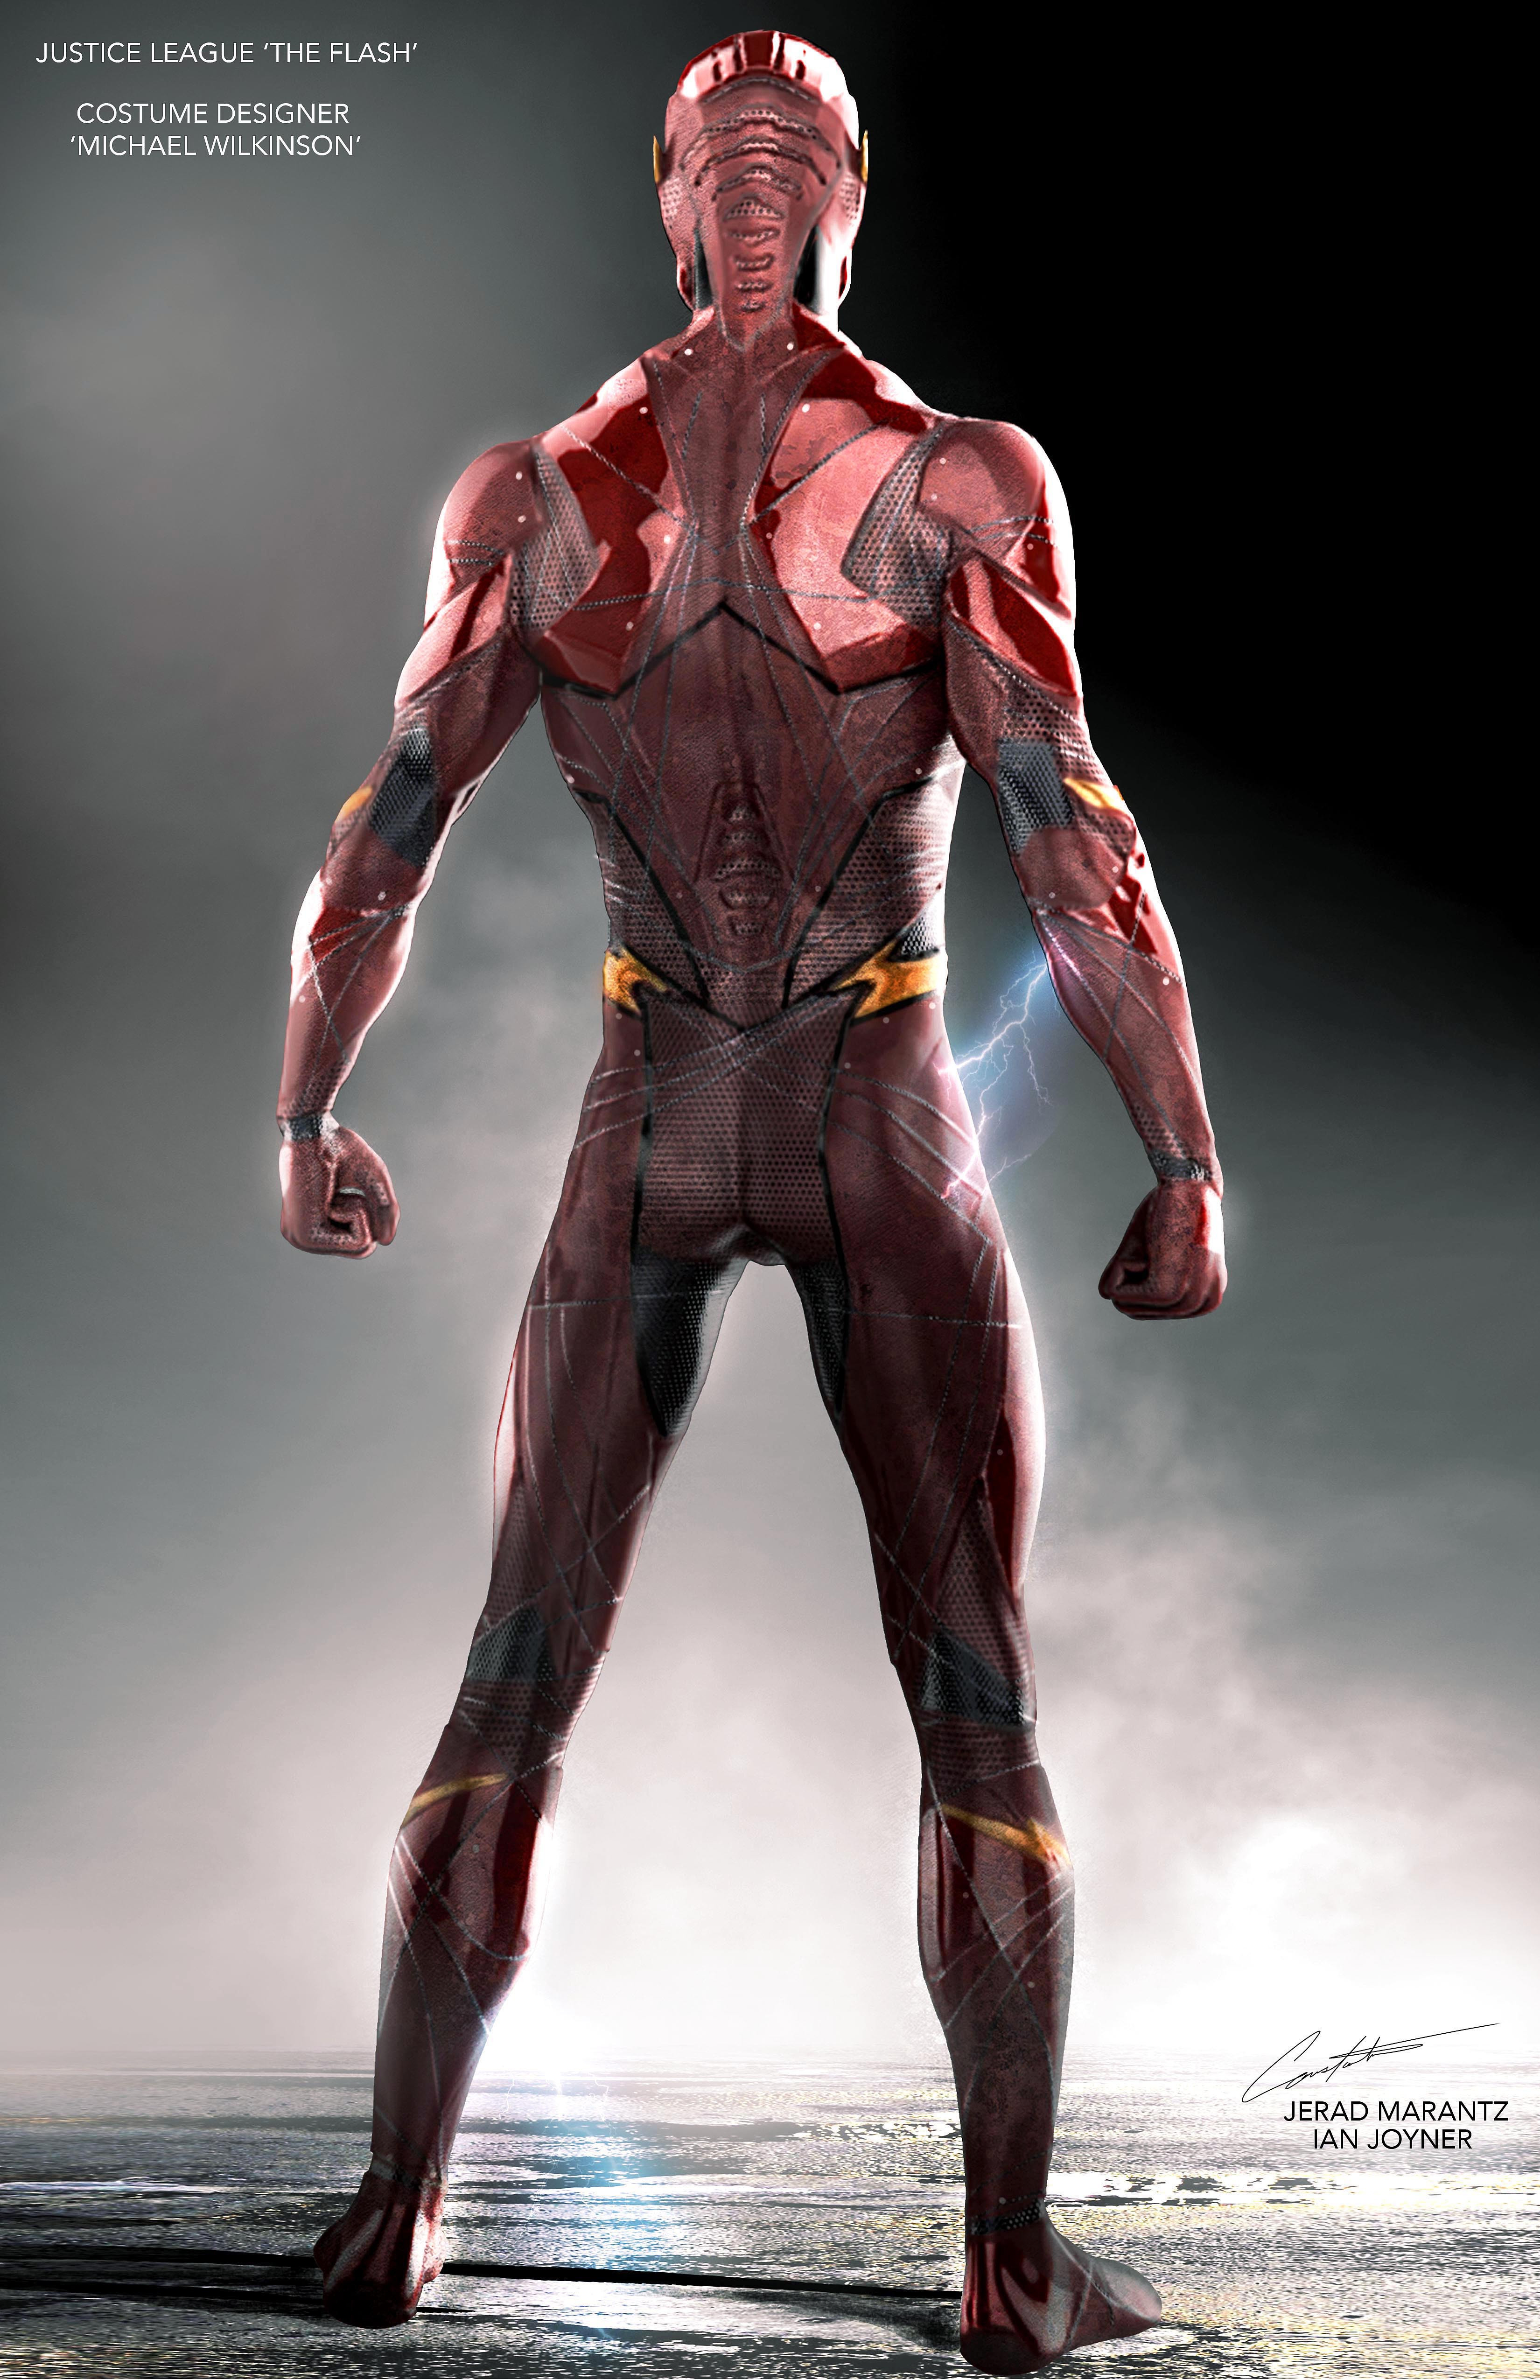 "Justice League 'The Flash"" Costume Concept Art"